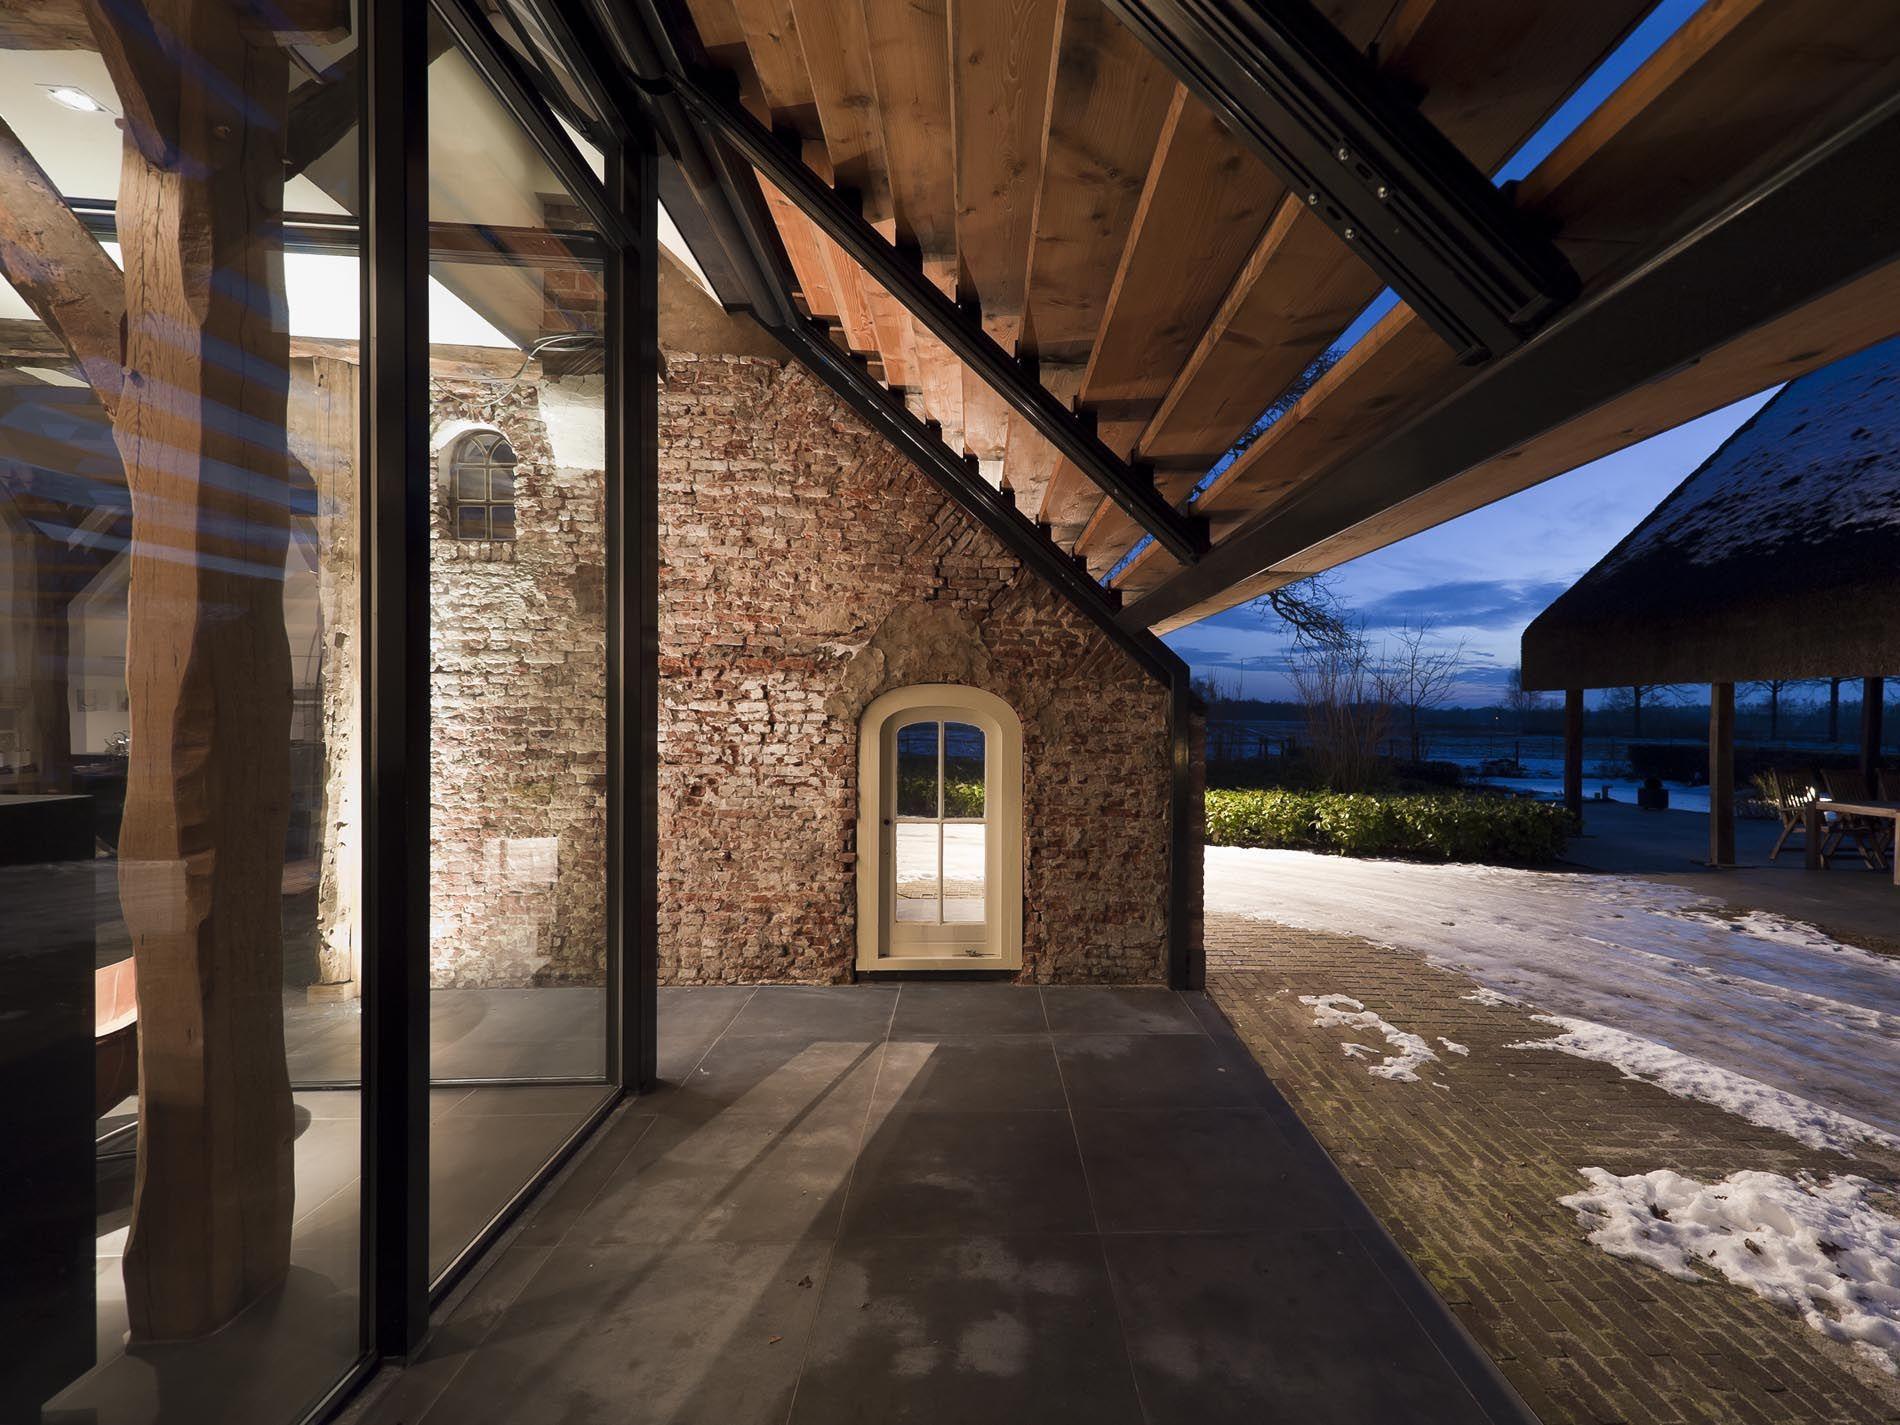 Maas architecten verbouwing boerderij tot woonhuis barchem architecture pinterest maas - Industrieel verblijf ...